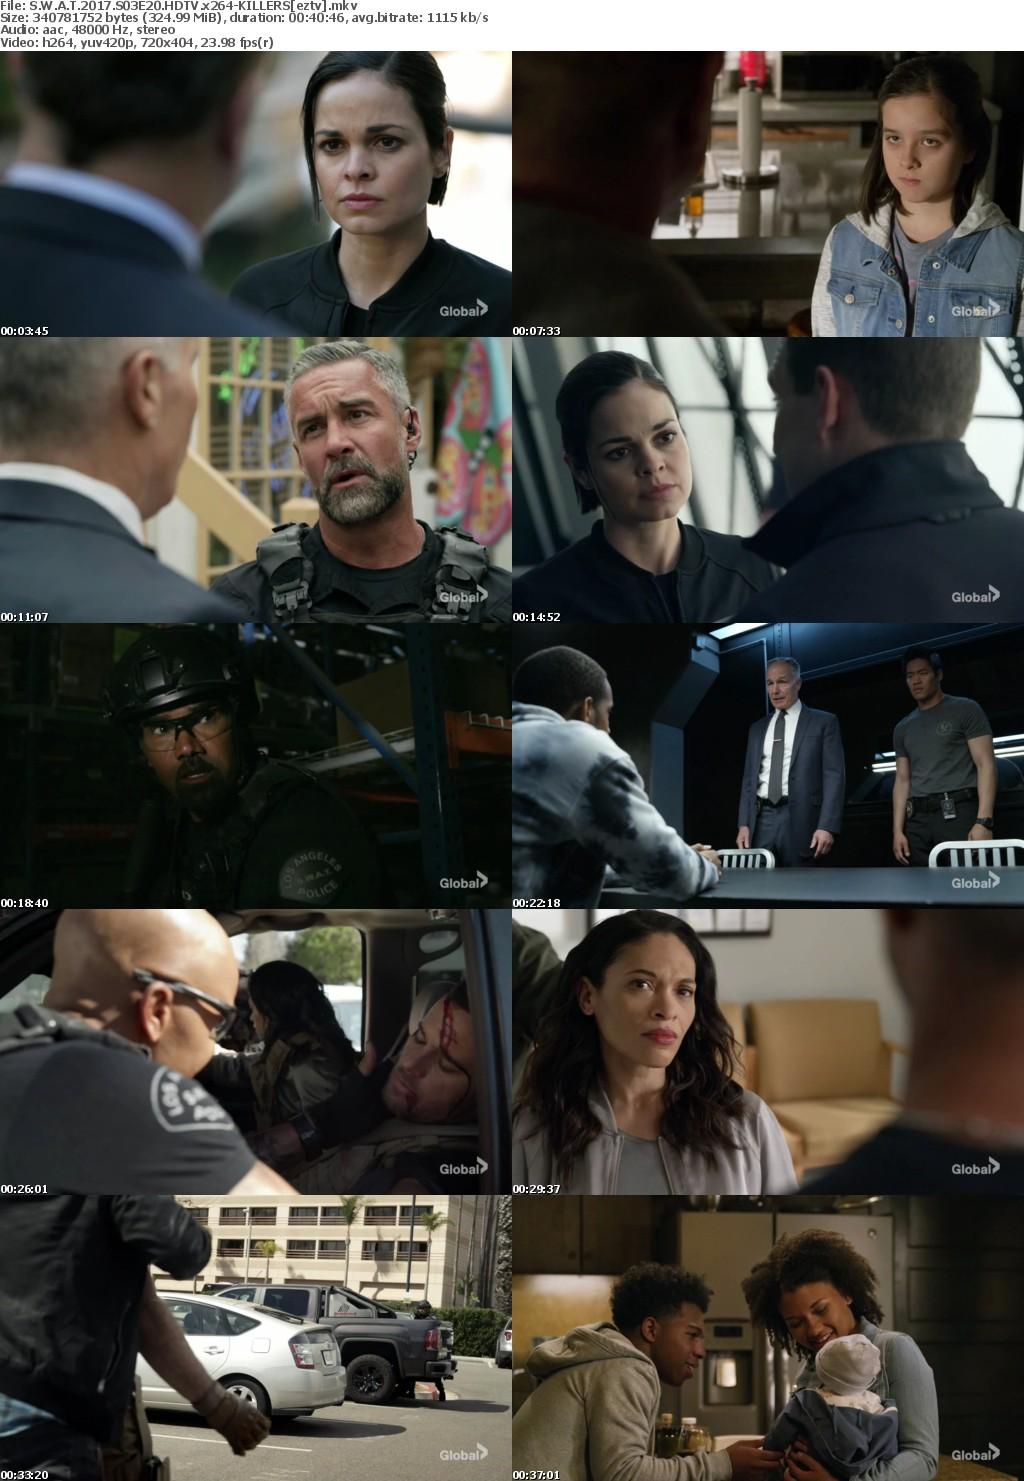 S W A T 2017 S03E20 HDTV x264-KILLERS